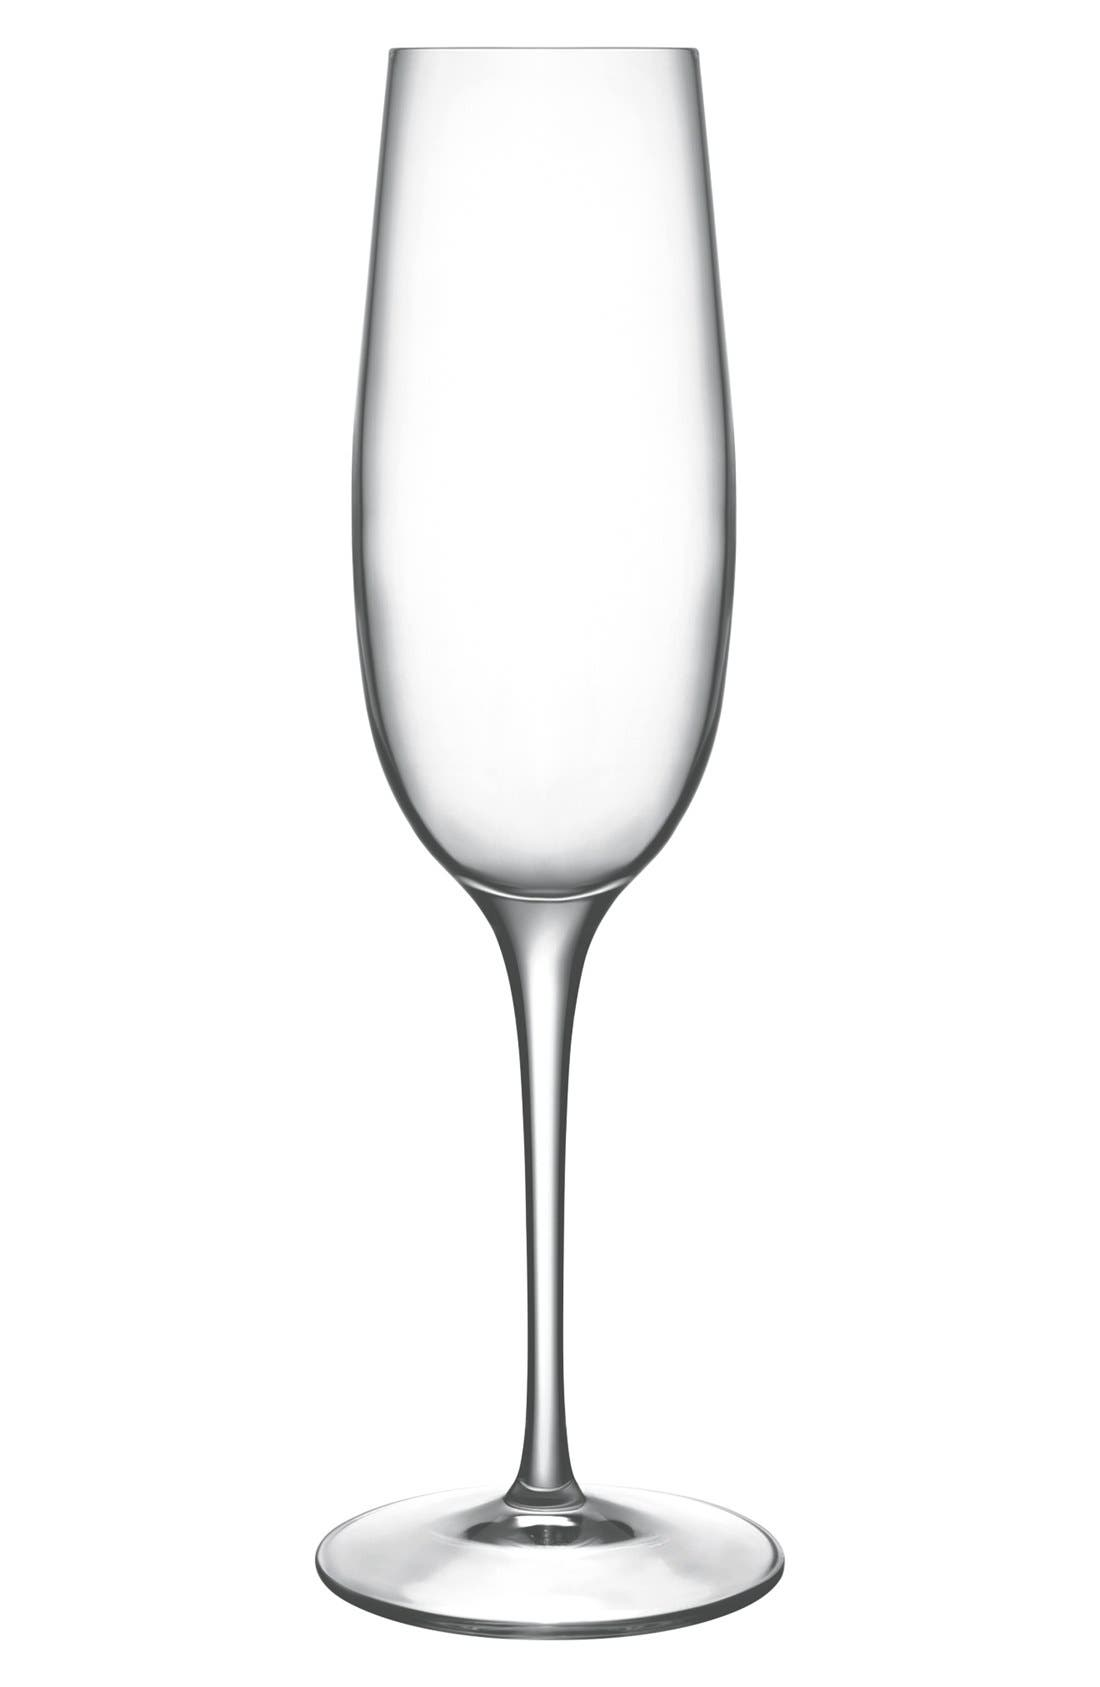 Main Image - Luigi Bormioli 'Crescendo' Champagne Flutes (Set of 4)